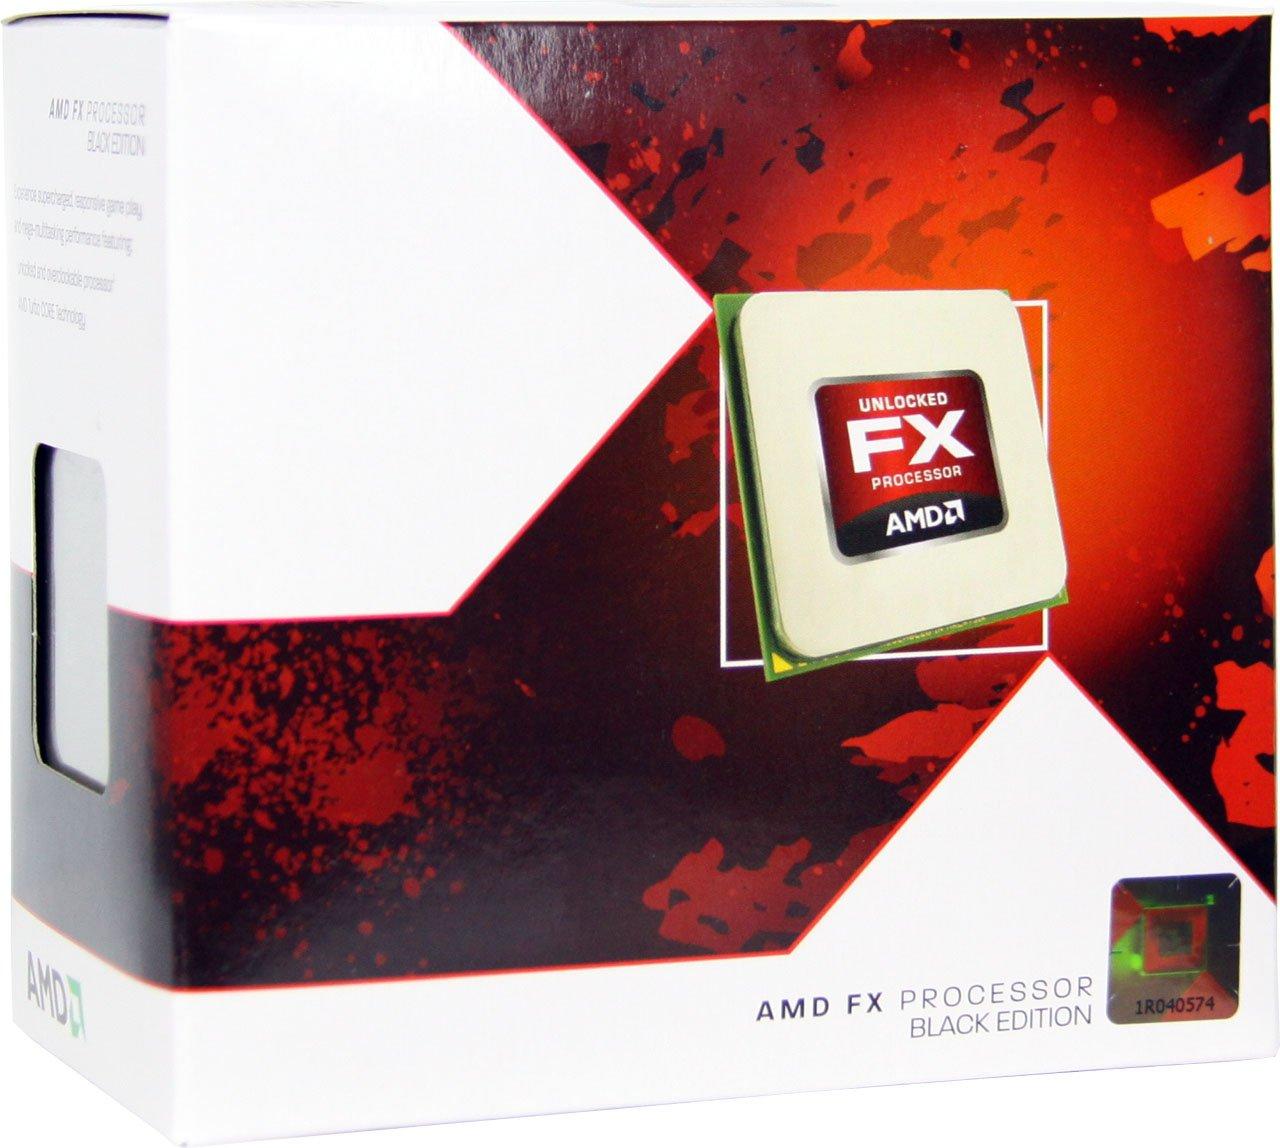 AMD FX  Processor GHz dp BJITG